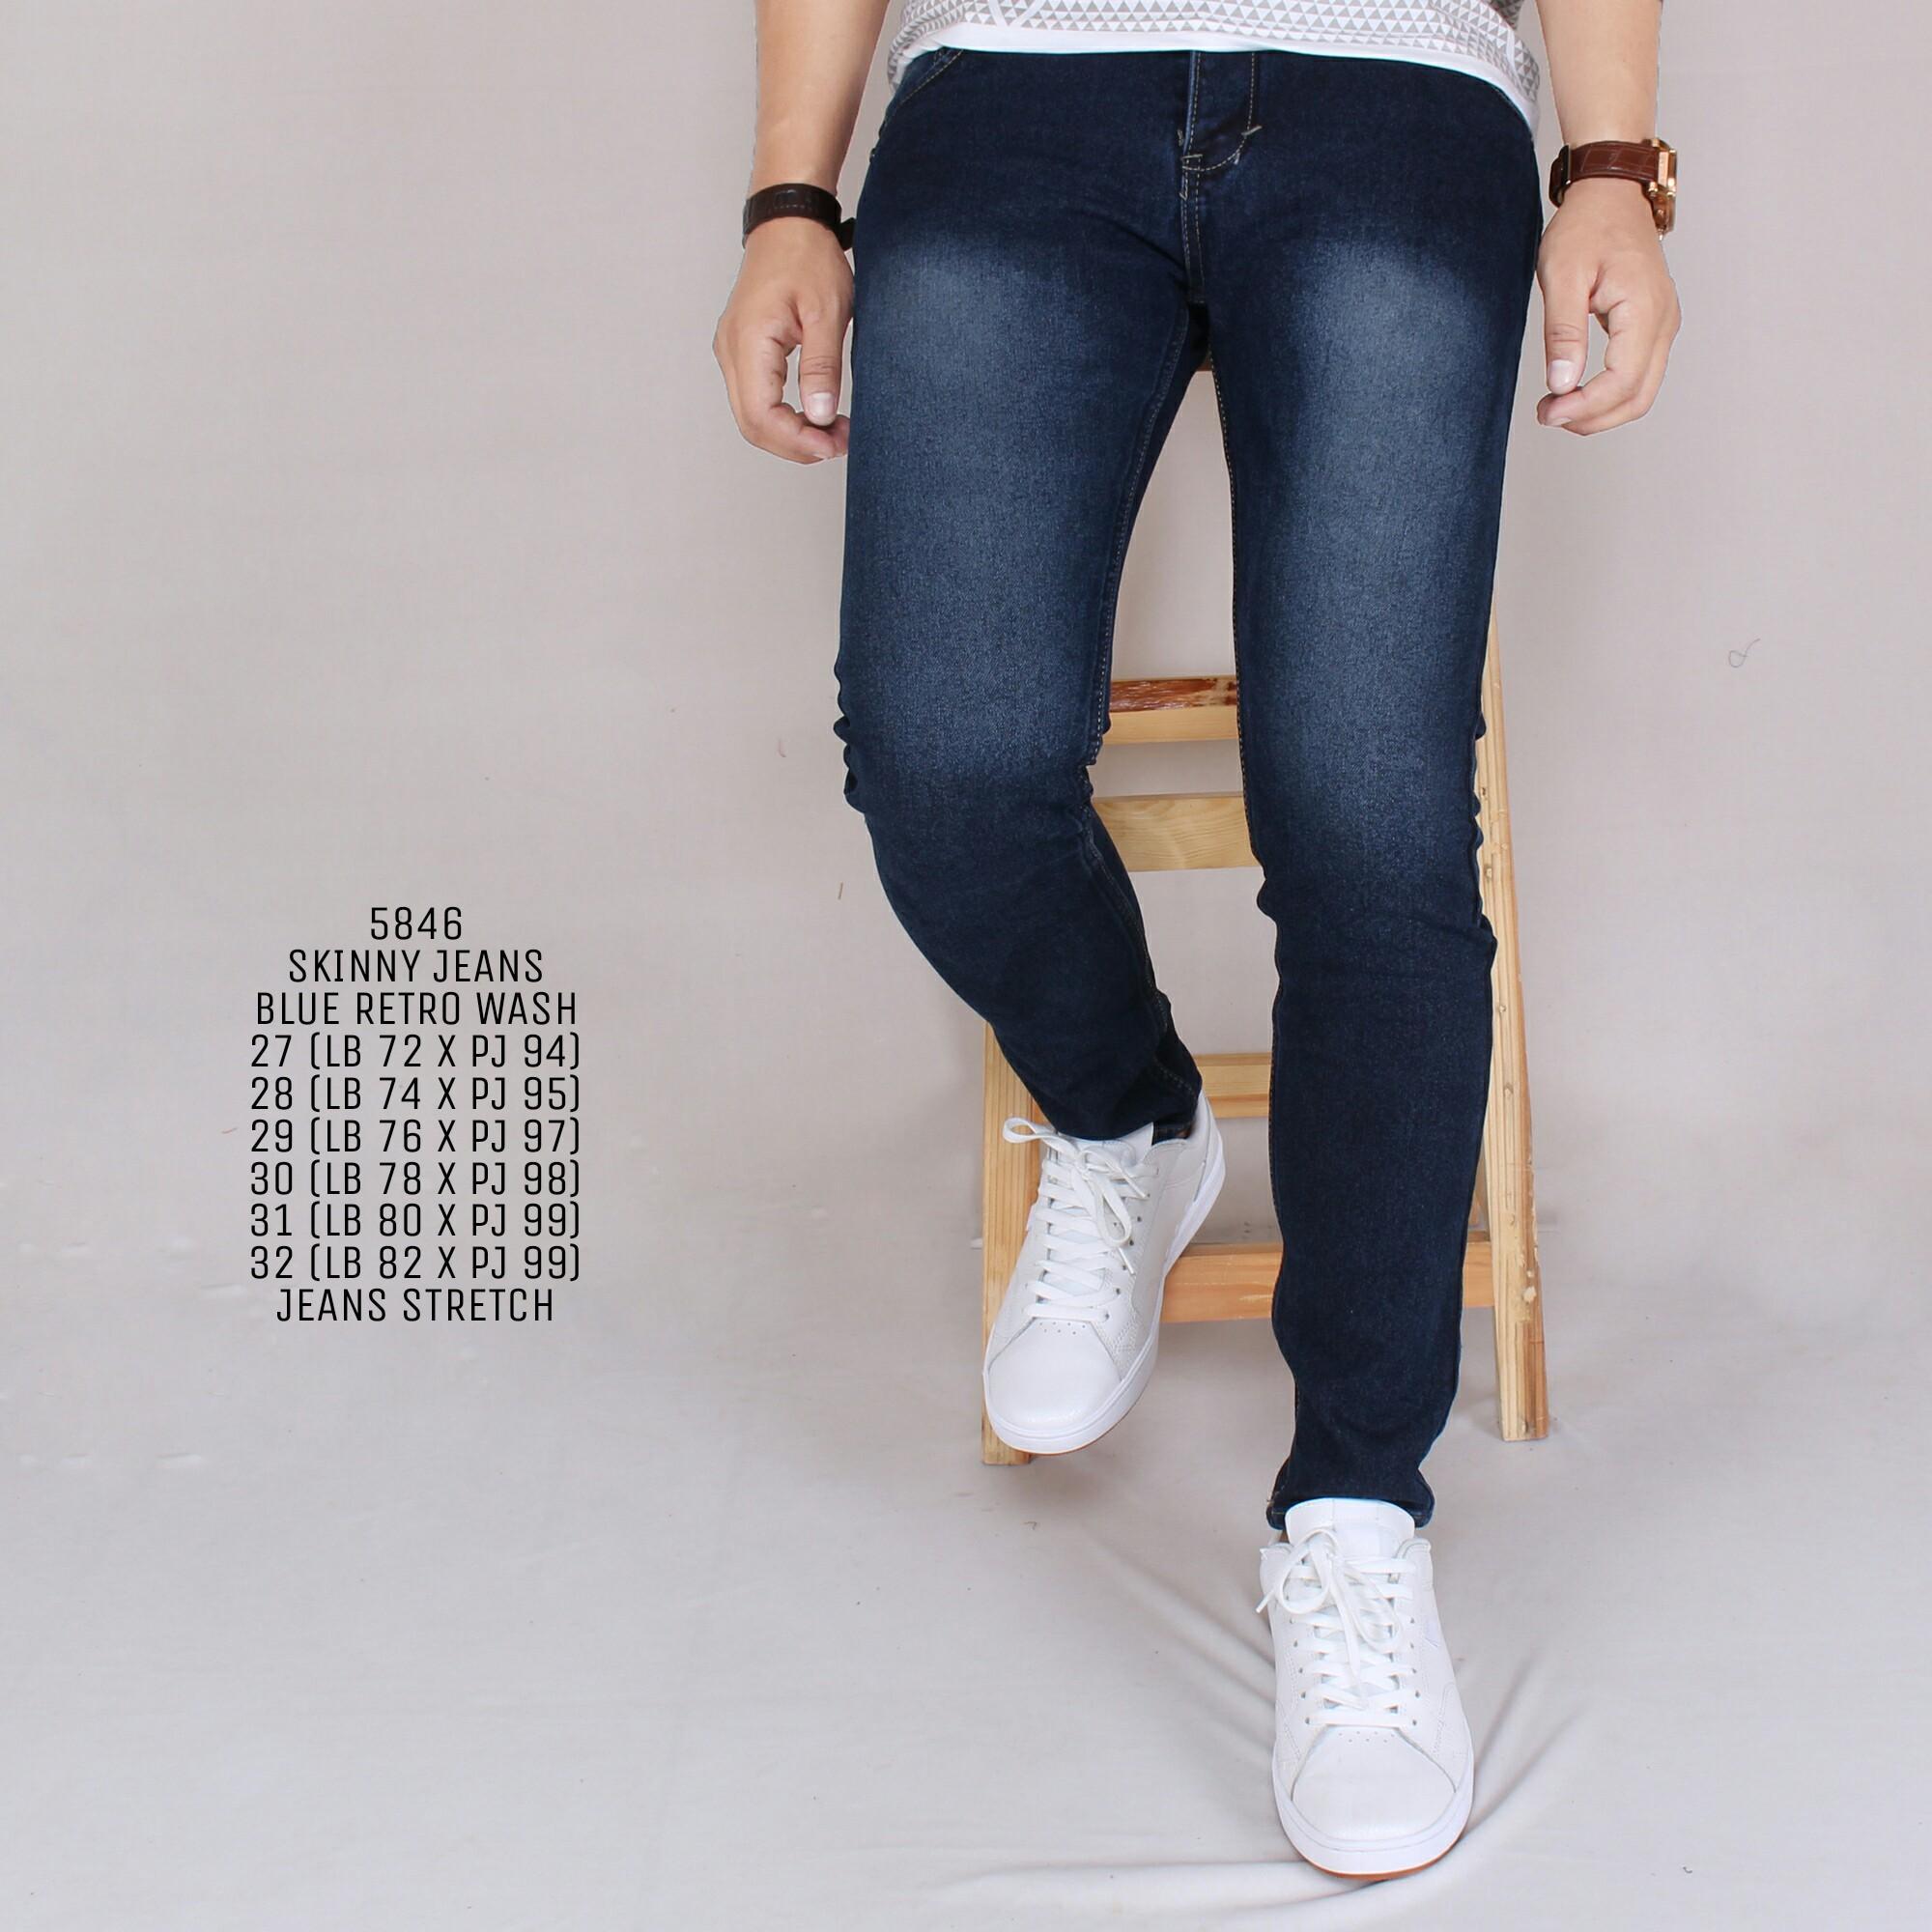 Zoeystore 5846 Celena Jeans Panjang Pria Celana Jeans Skinny Cowok Washing Blue Cut Rips Celana Jeans Slimfit Denim